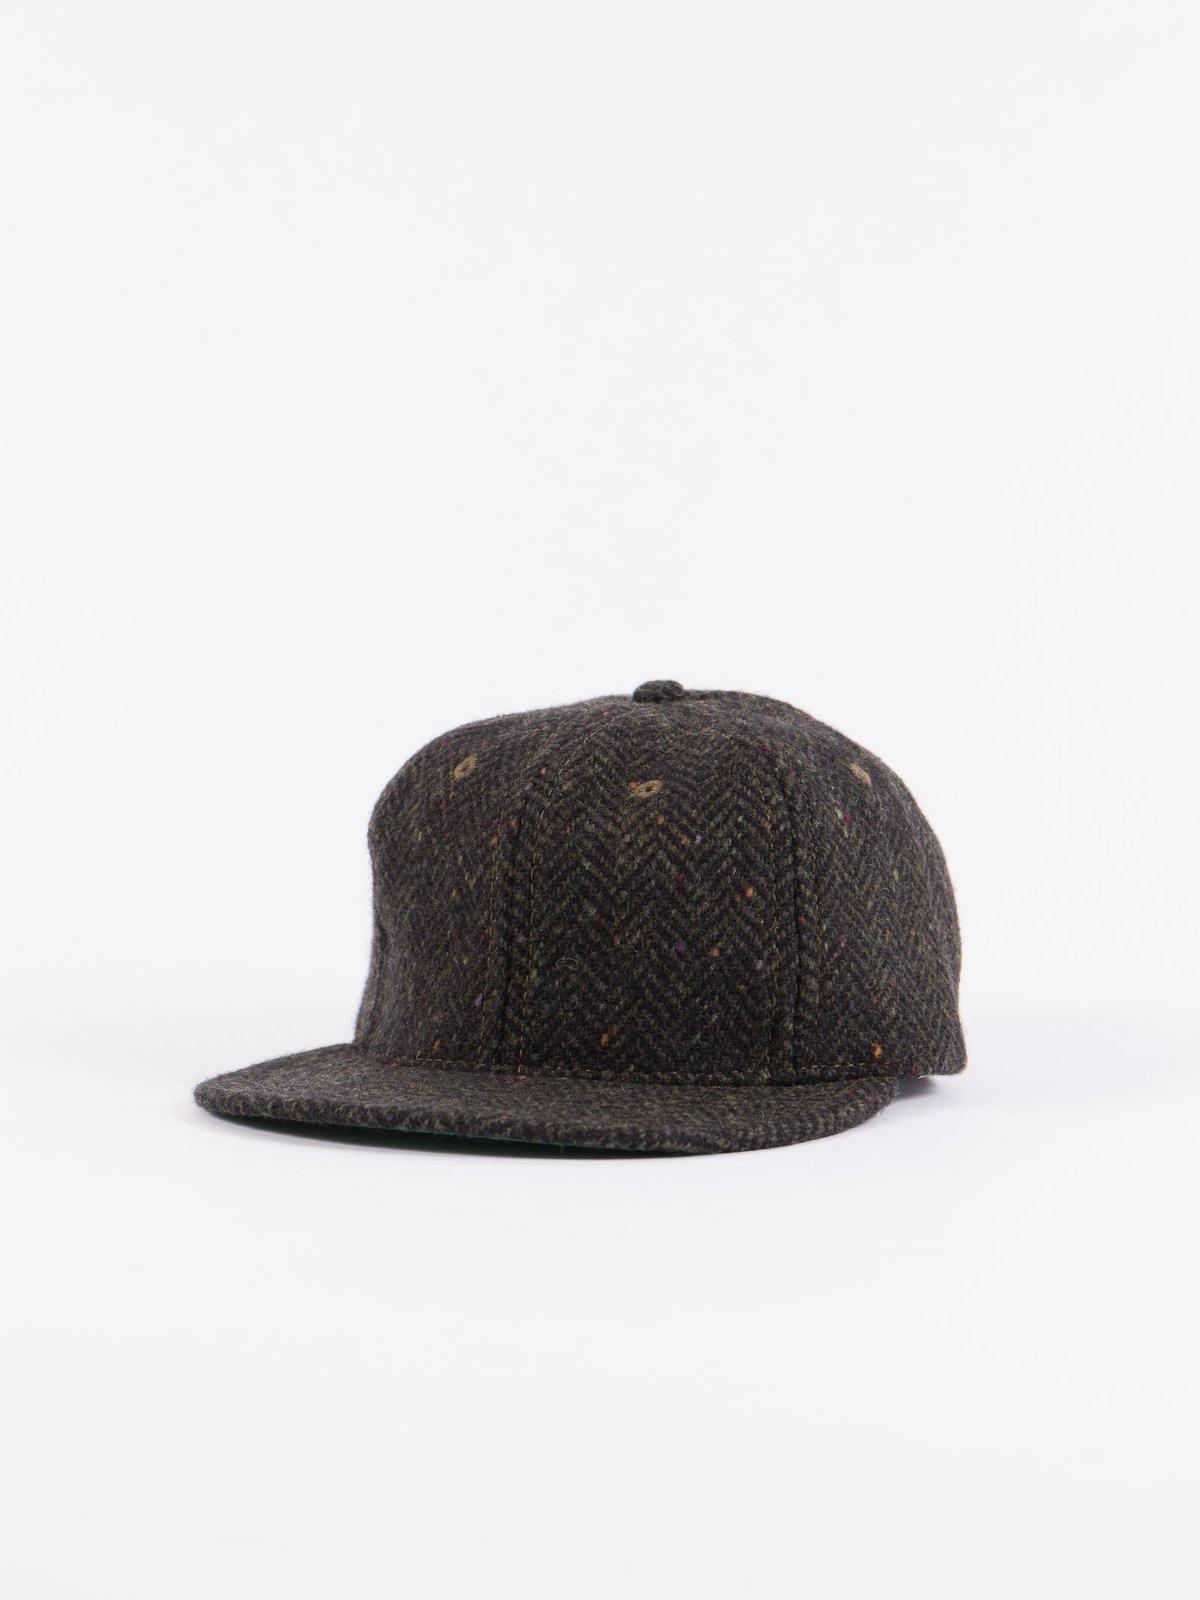 Olive HB Tweed NIer 6 Panel Ballcap - Image 1